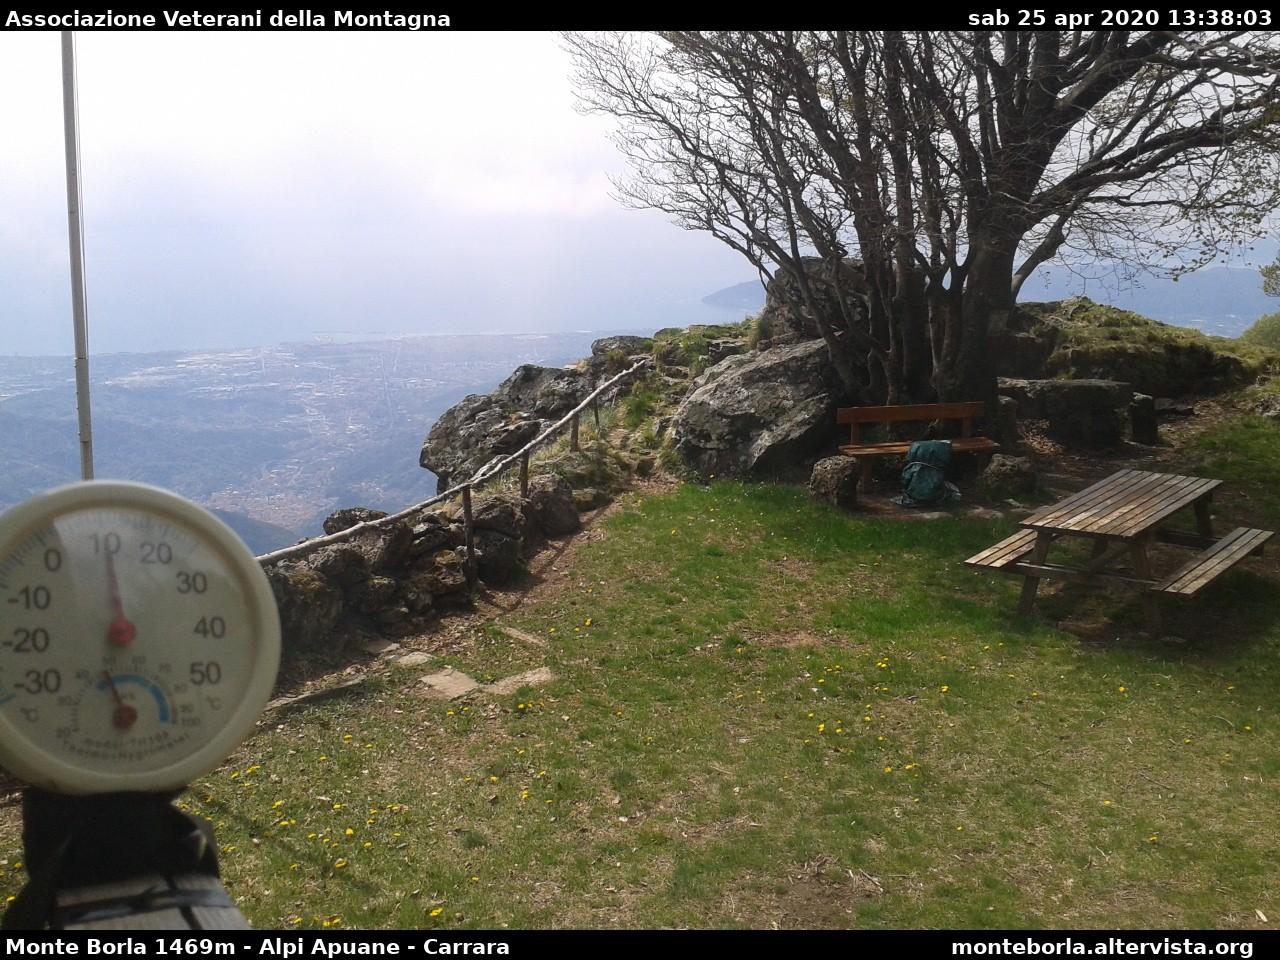 webca monte borla - alpi apuane